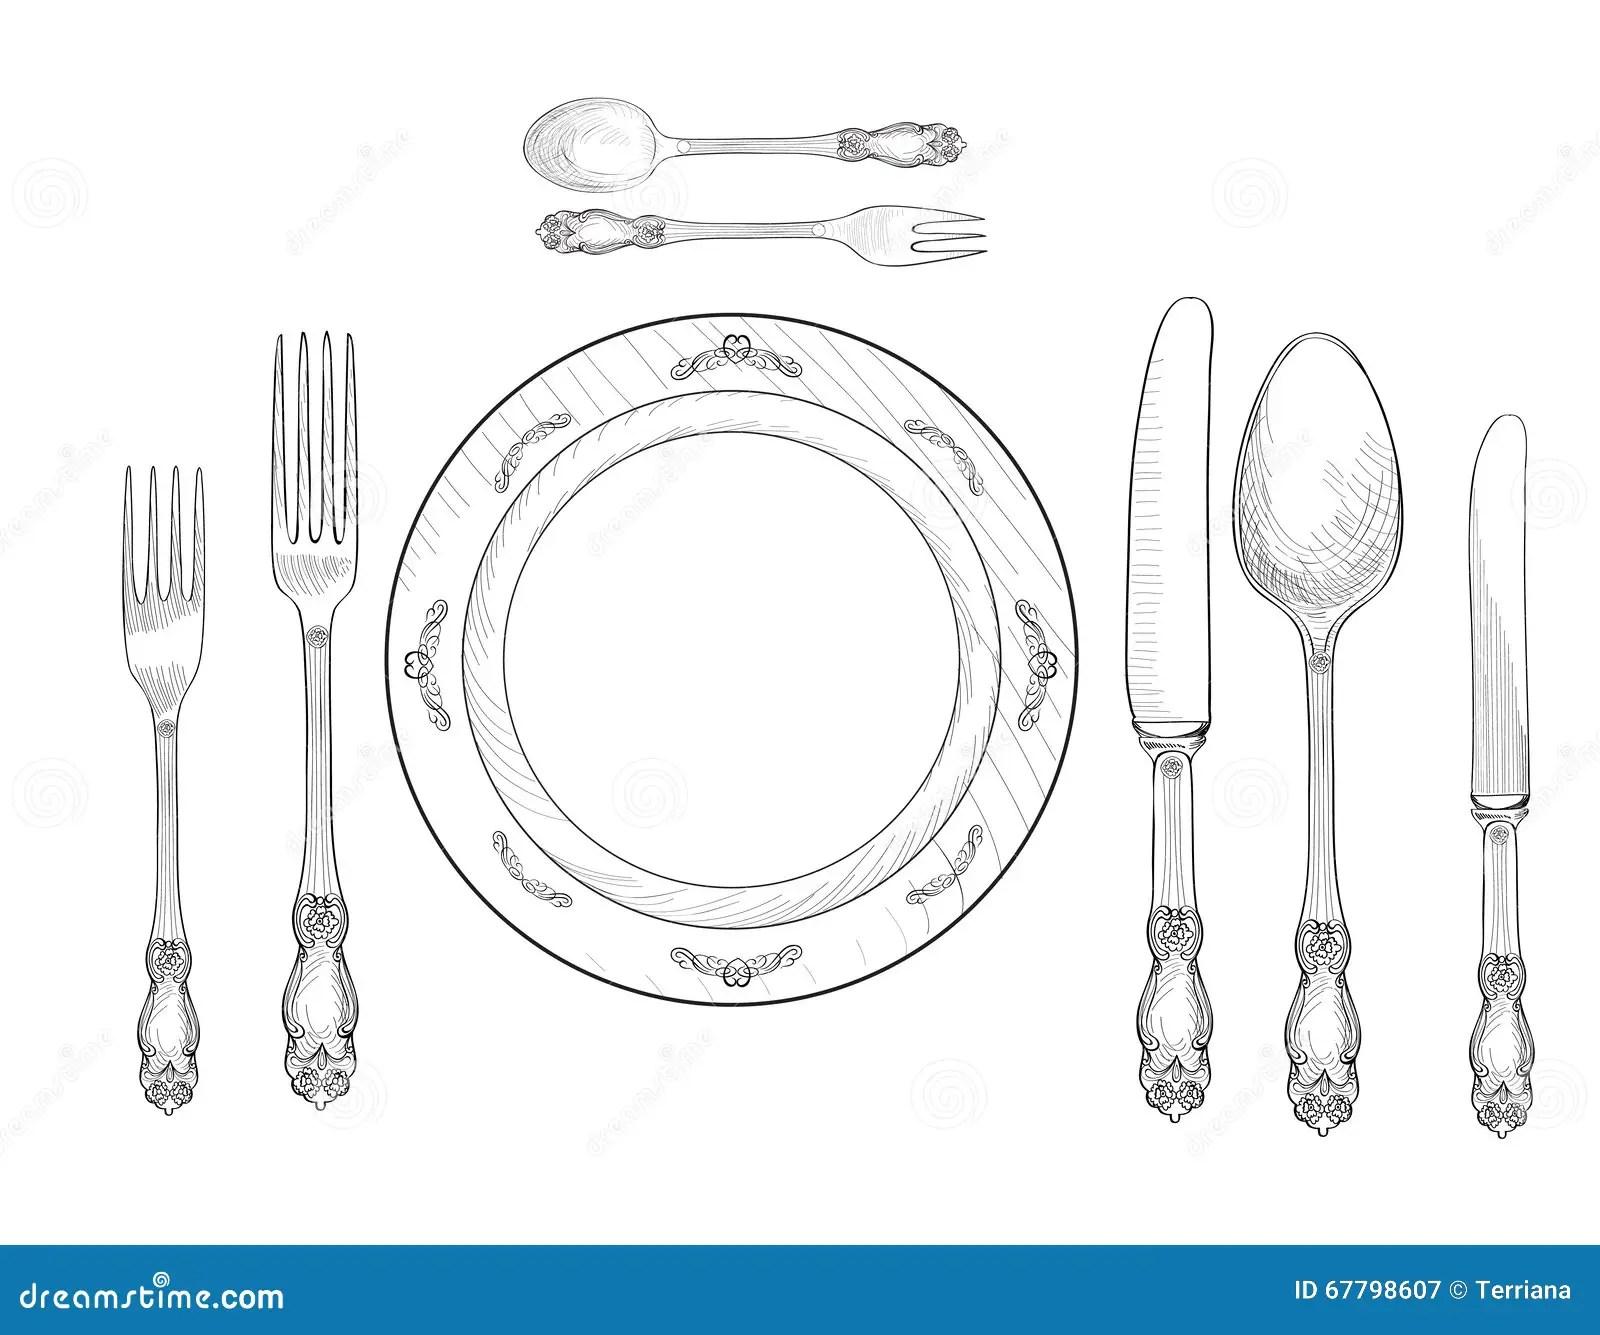 Table Setting Set Fork Knife Spoon Plate Sketch Set